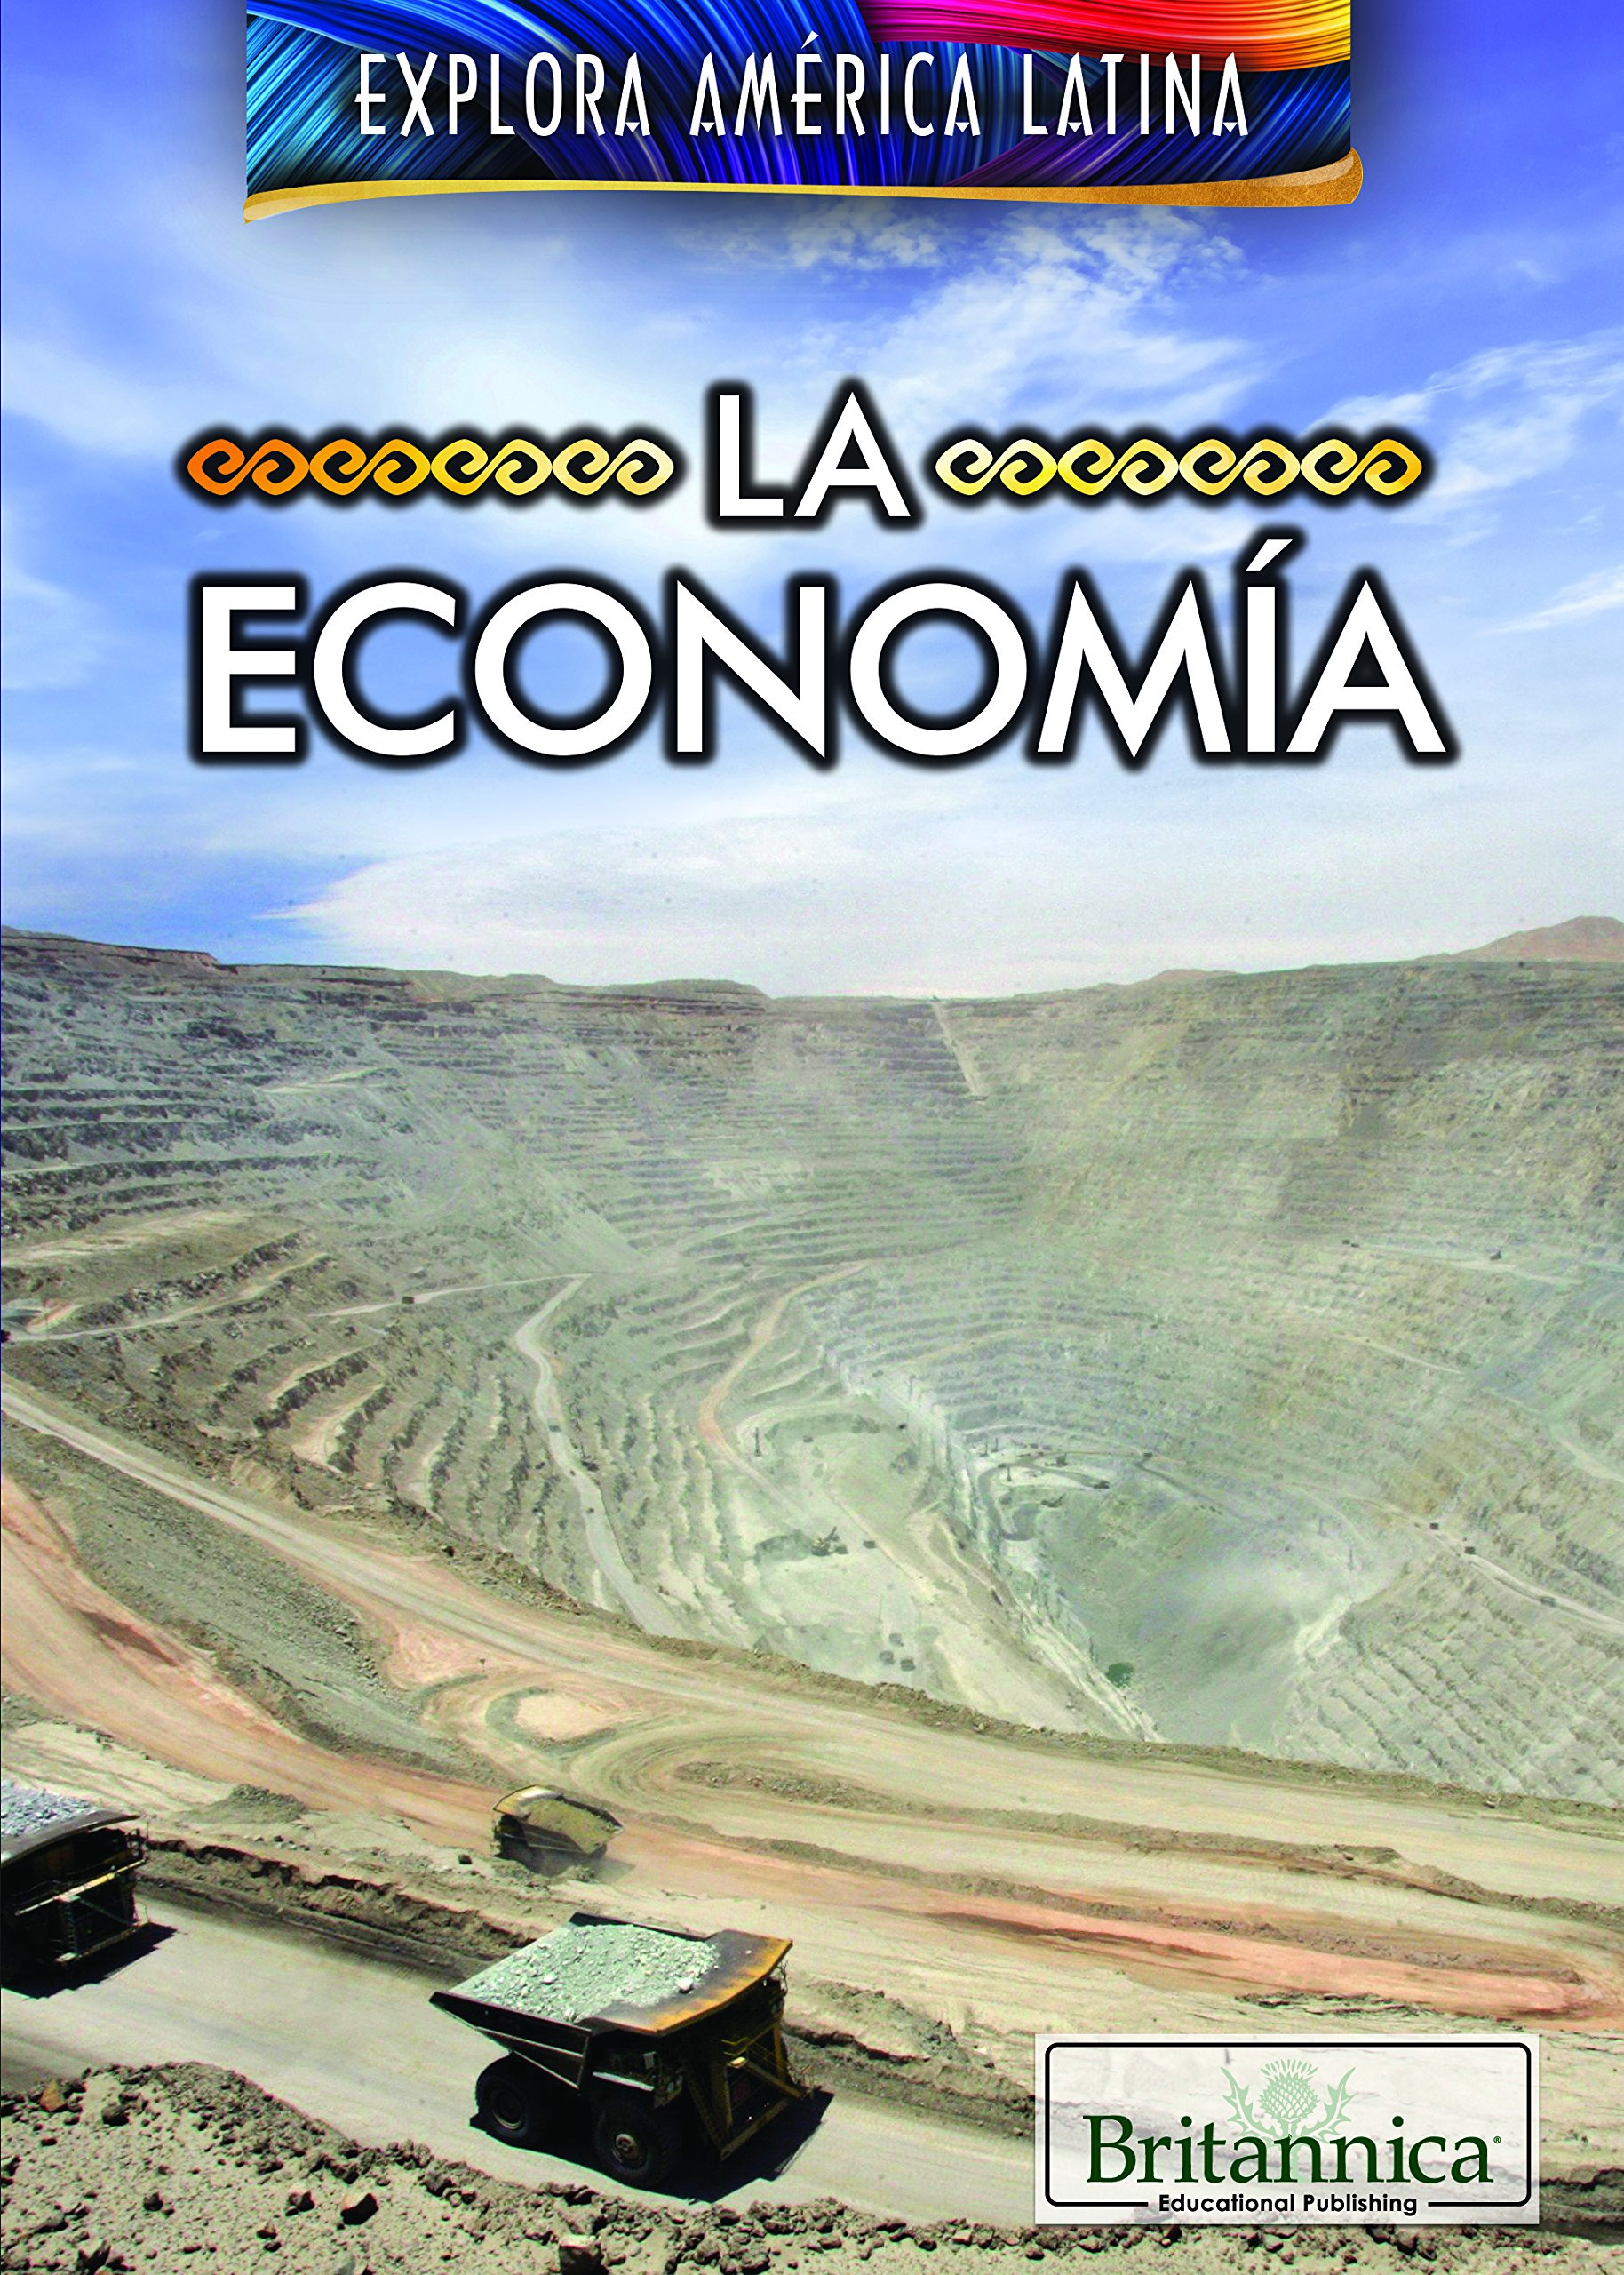 Read Online La economía/ The Economy of Latin America (Explora América Latina/ Exploring Latin America) (Spanish Edition) PDF